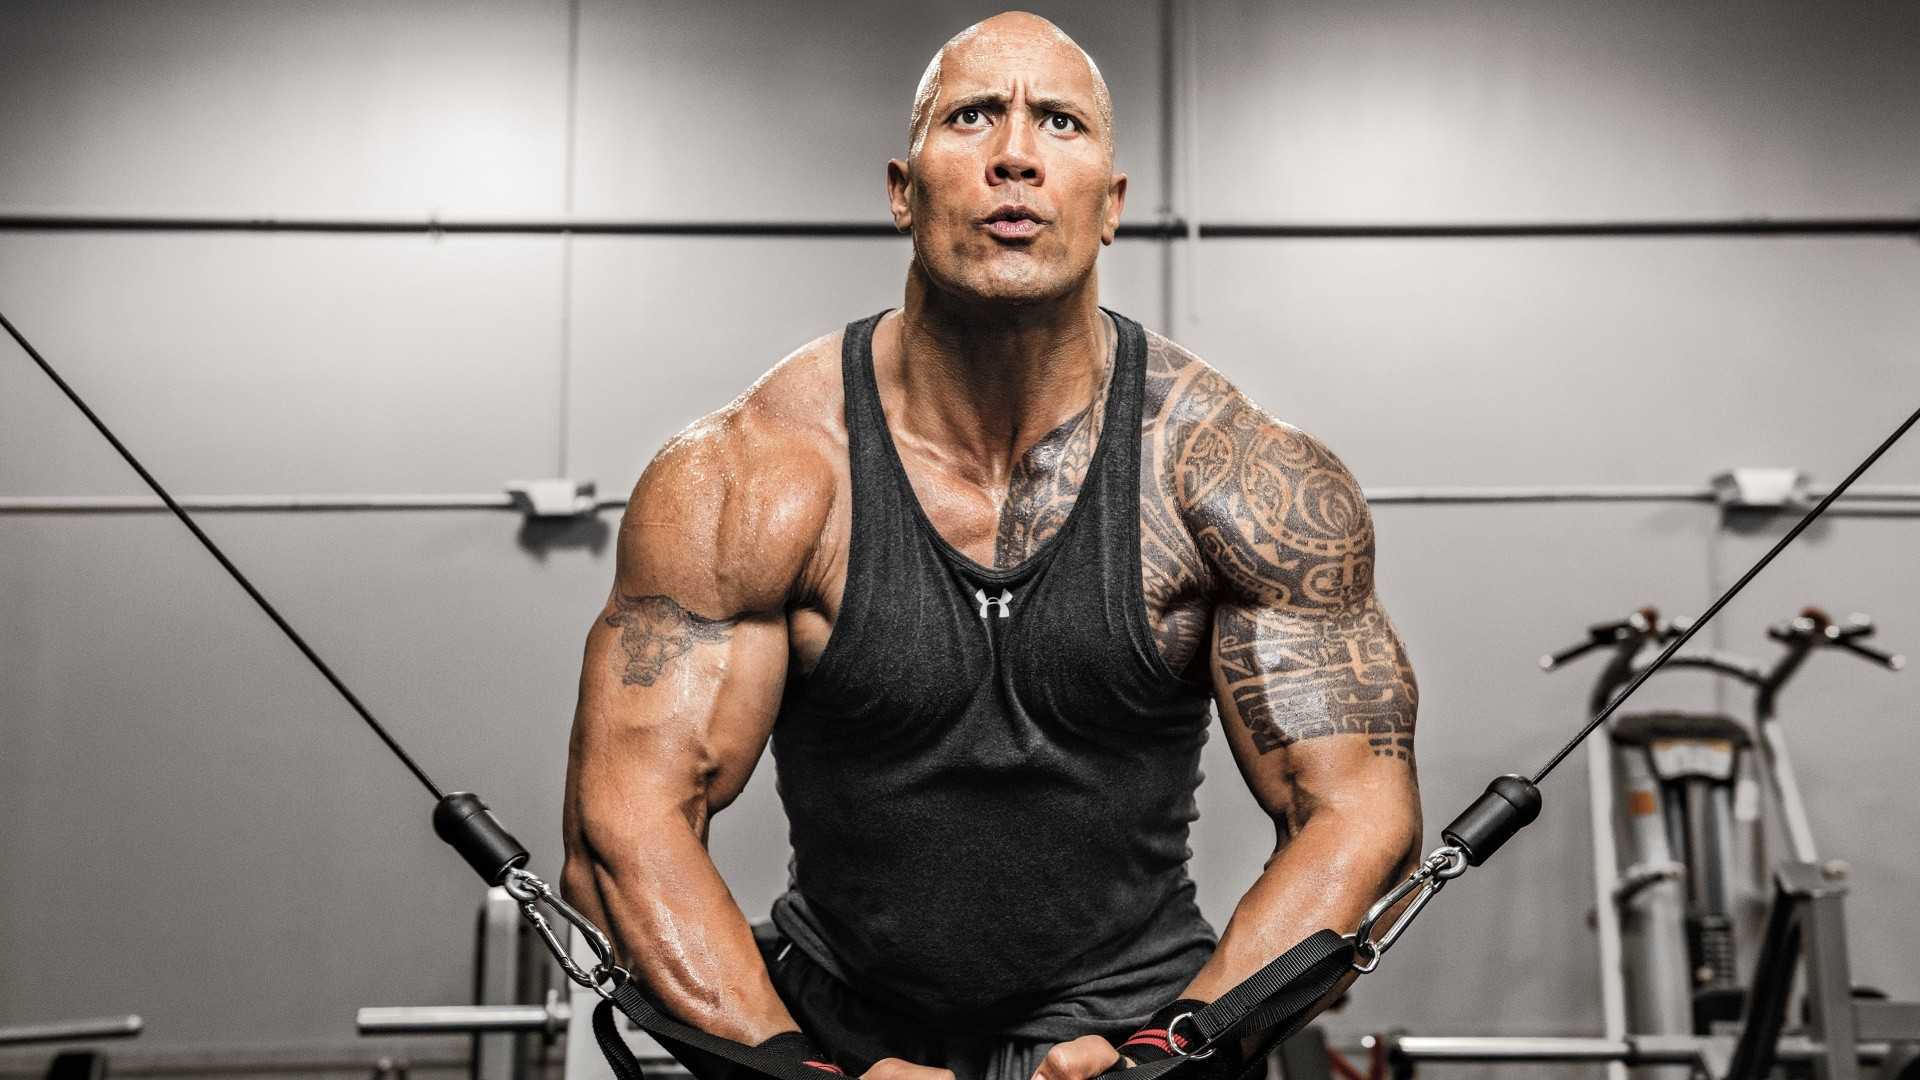 Download 1920x1080 Wallpaper Dwayne Johnson In Gym, Fitness, Full Hd